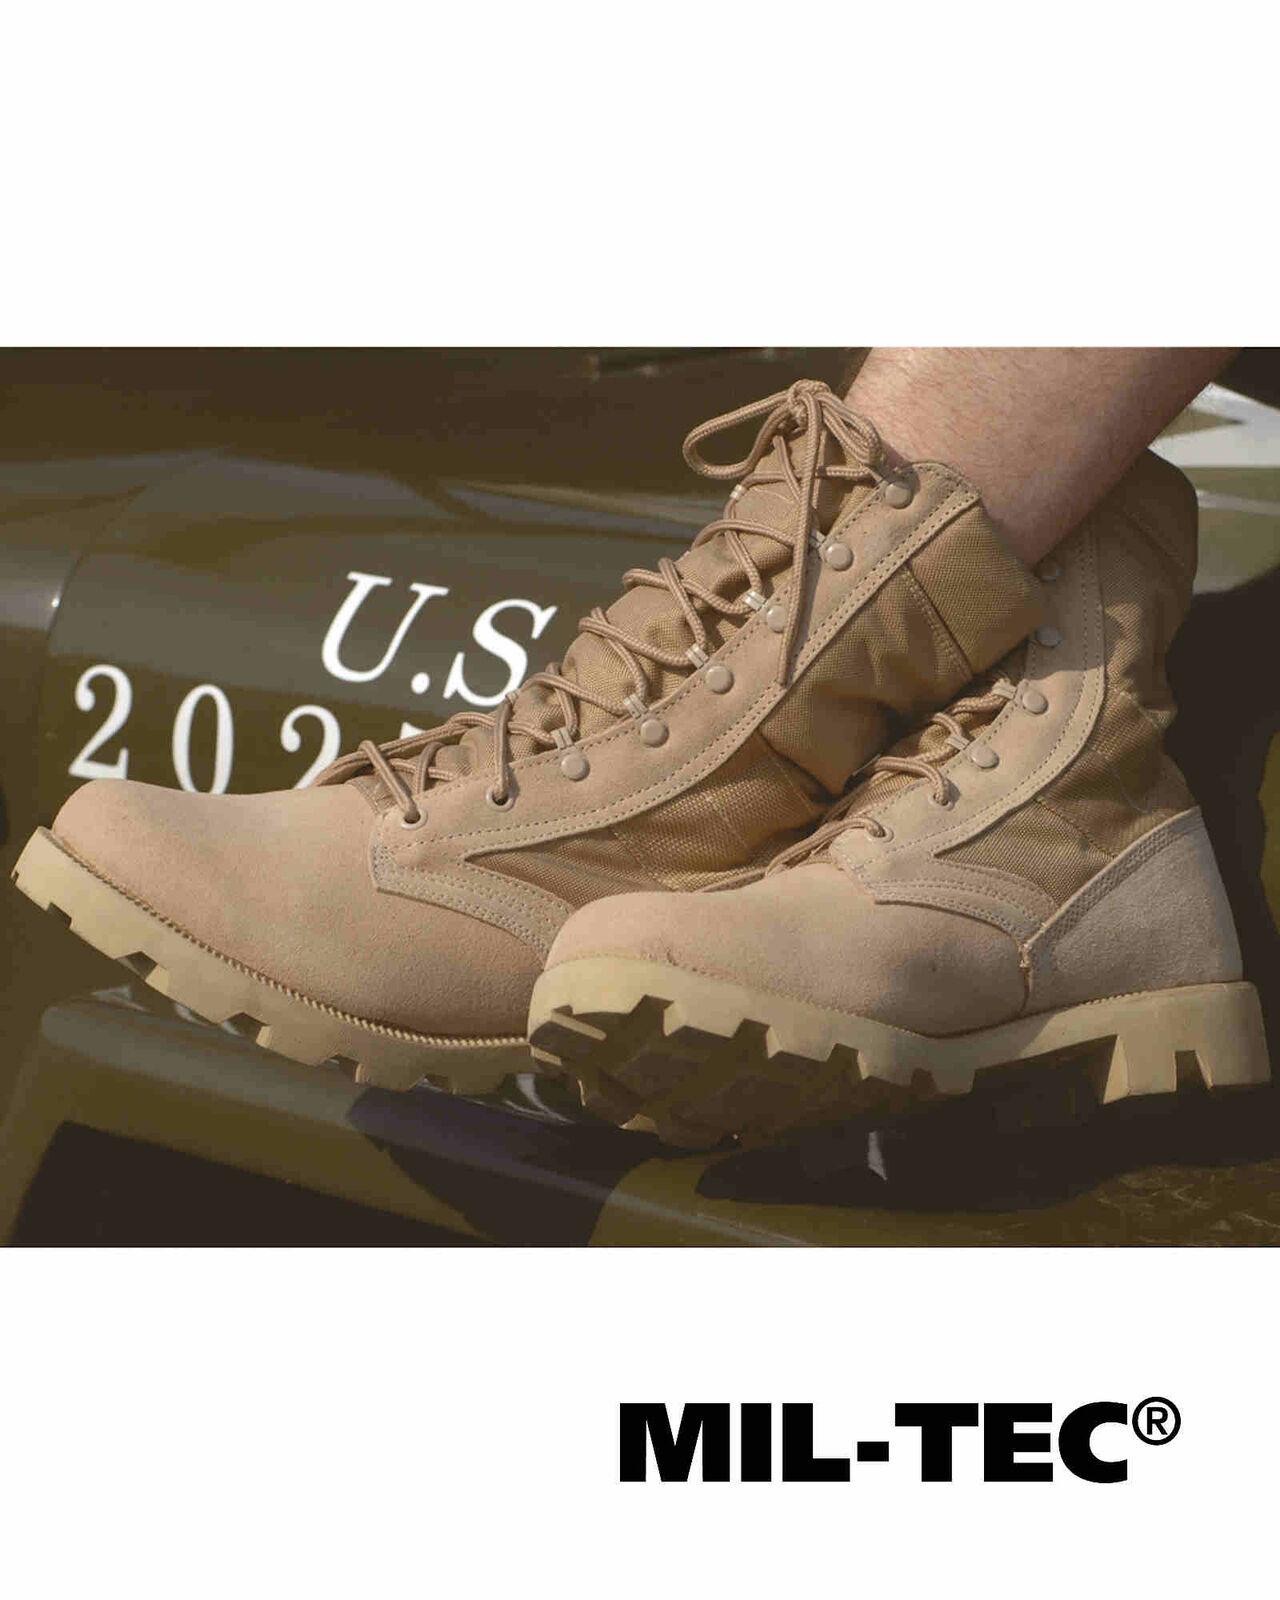 Mil-Tec US DESERTStiefel Schuhe SPEED LACE KHAKI Stiefel Schuhe